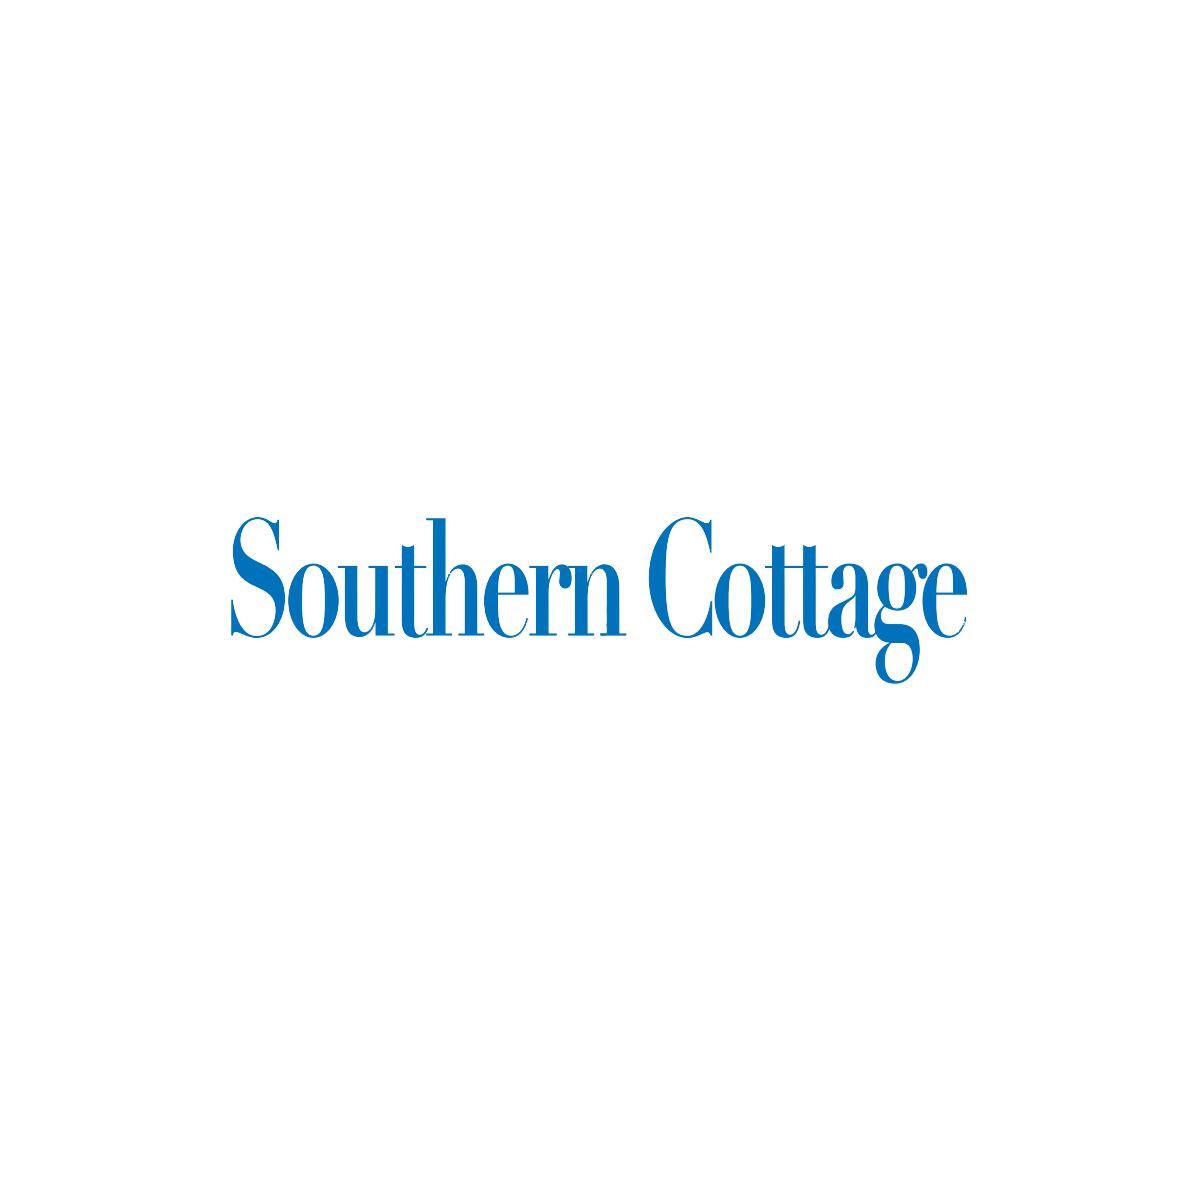 southerncottage.jpg